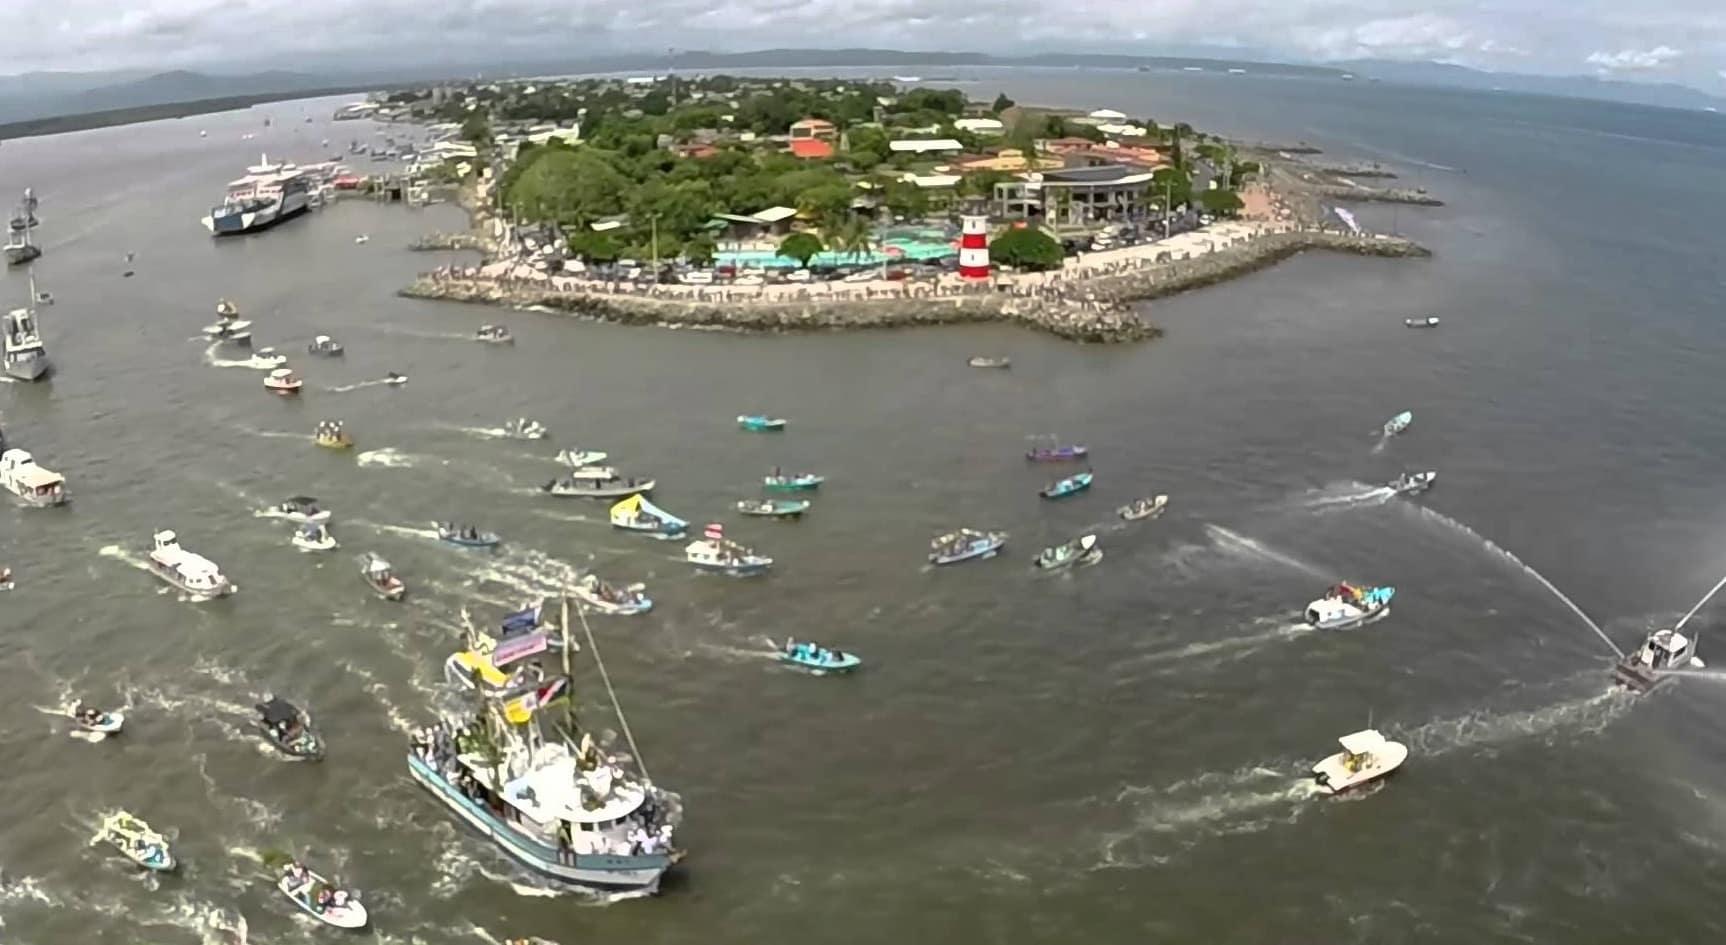 vacances-festival-mar-puntarenas-costa-rica-decouverte